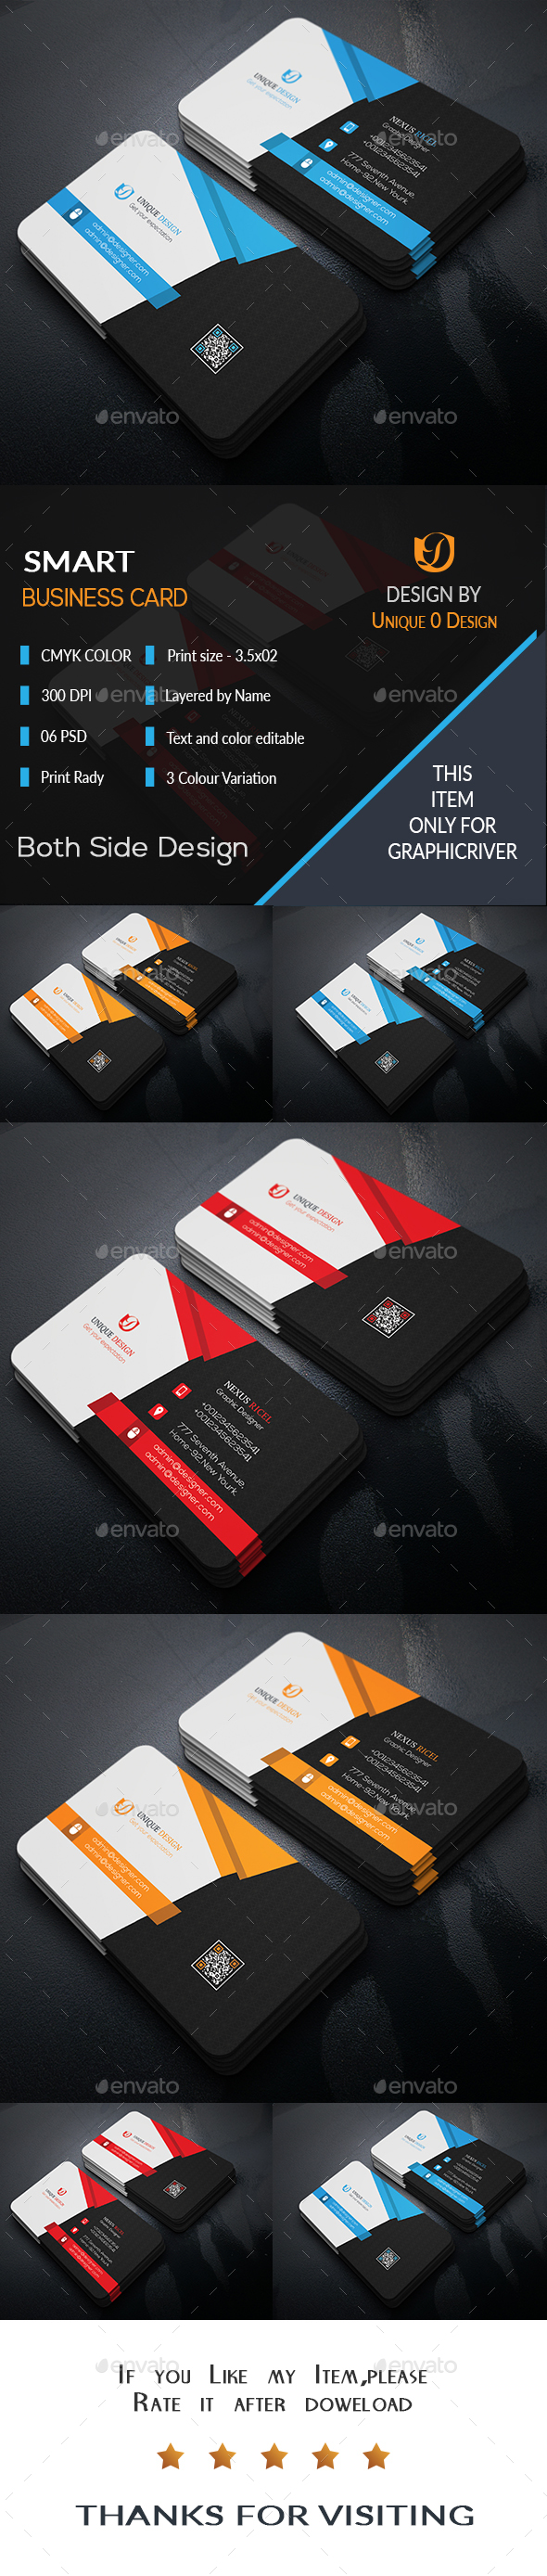 Smart Business Card - Business Cards Print Templates | Business ...